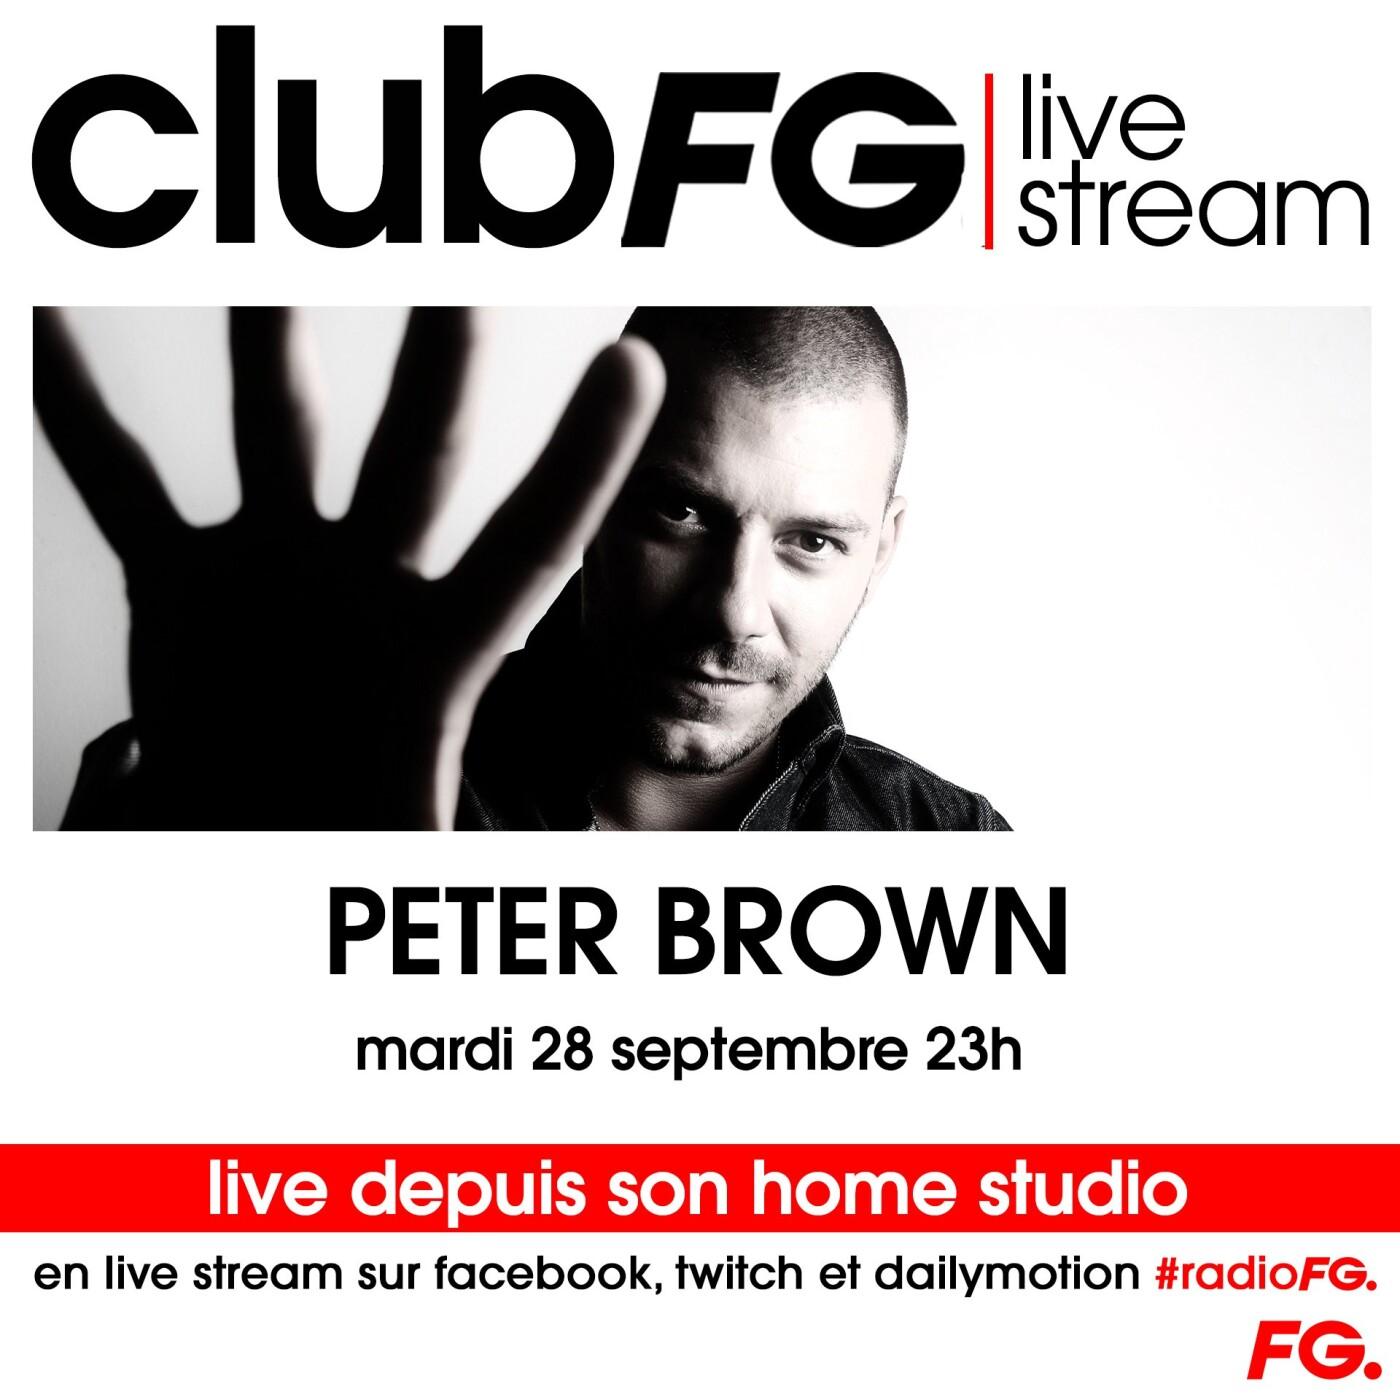 CLUB FG LIVE STREAM : PETER BROWN